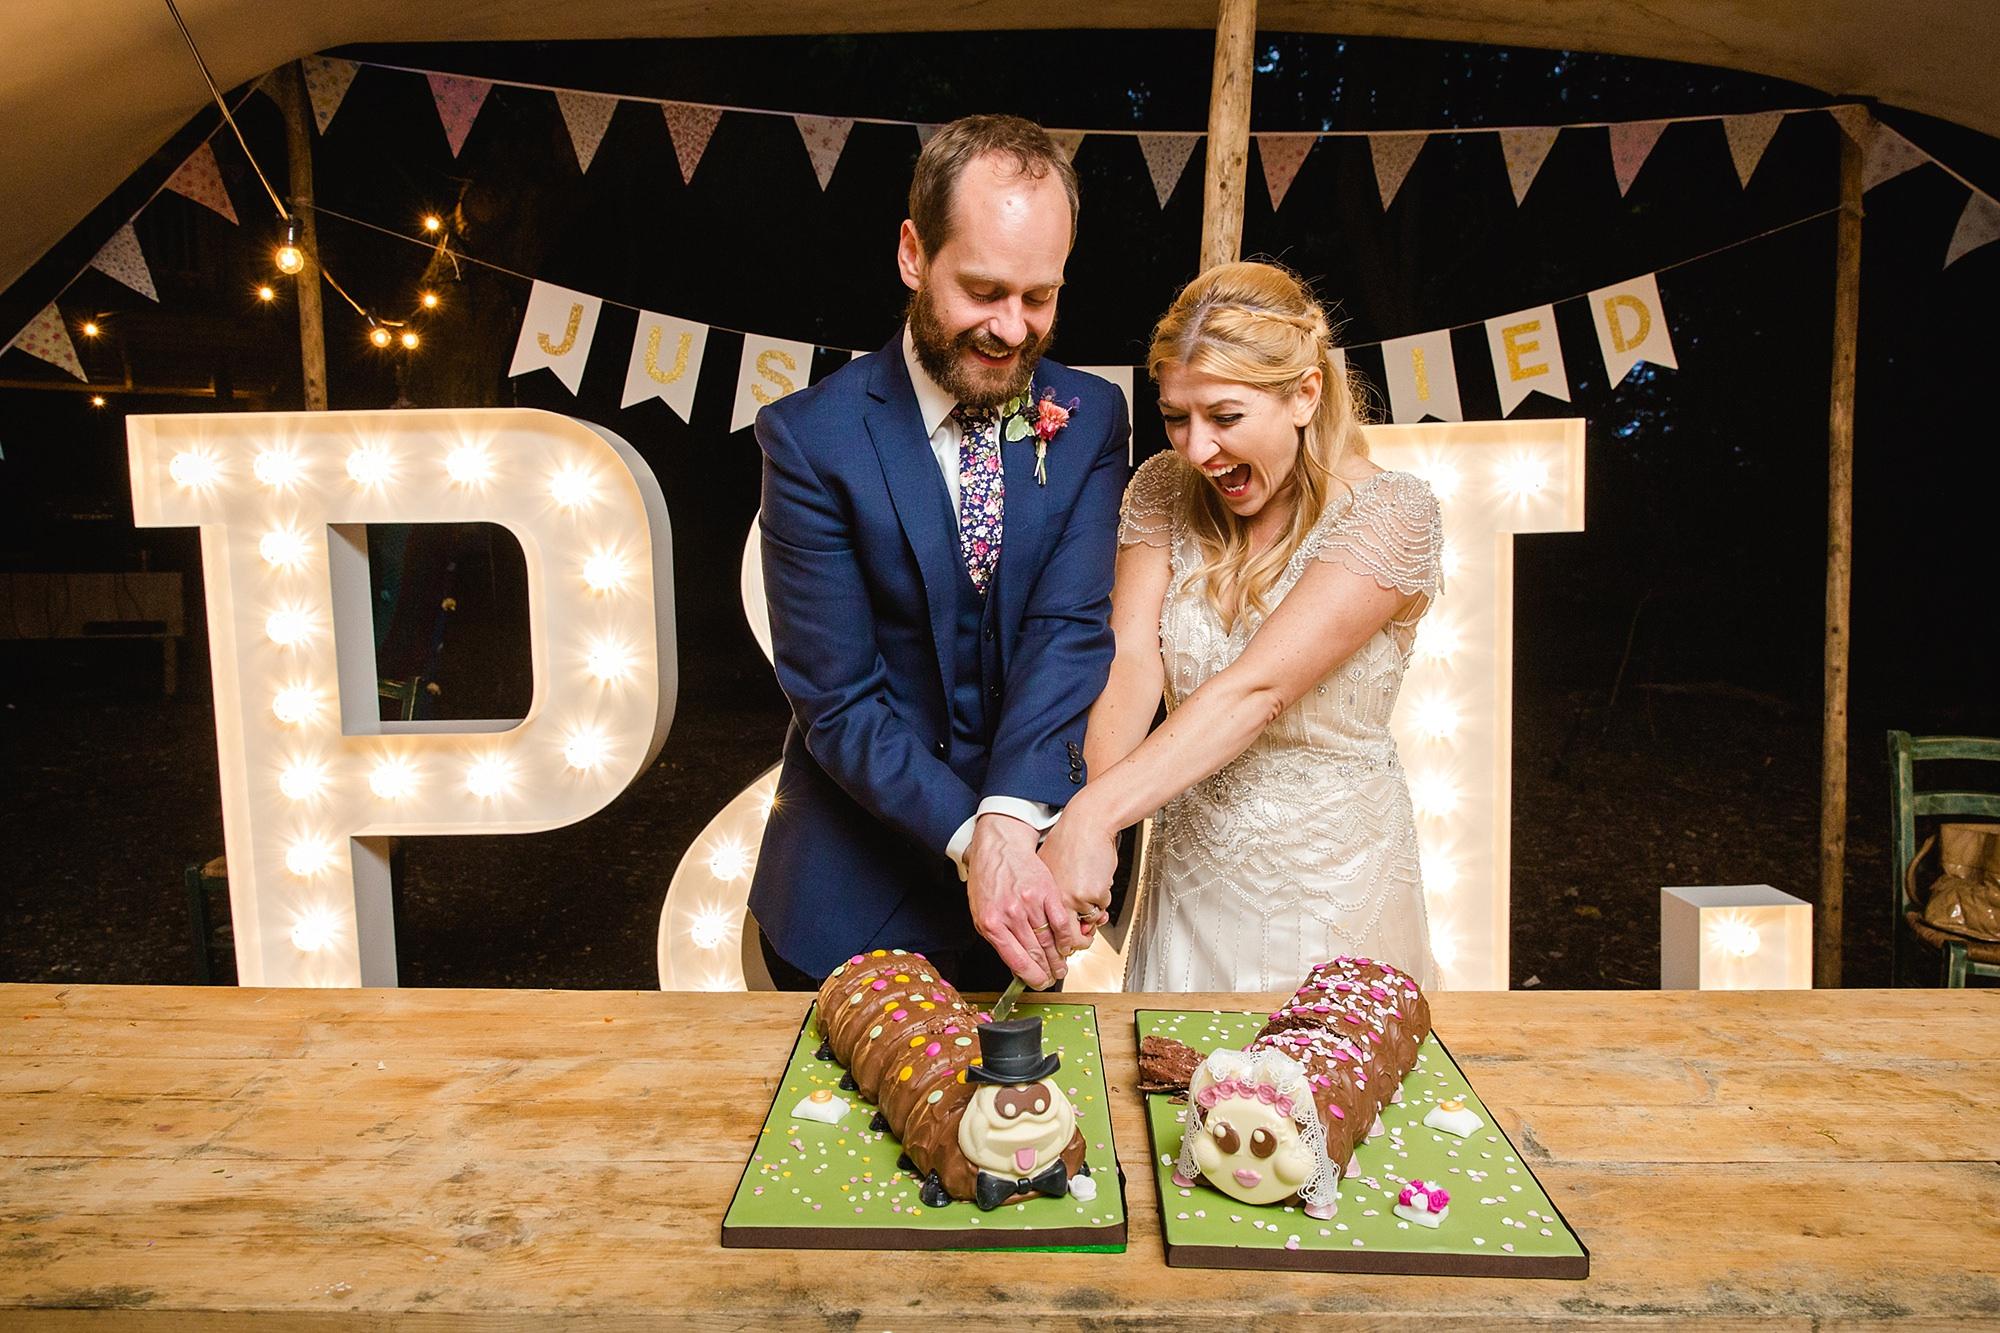 Woodland Weddings Tring bride and groom cut caterpillar cake